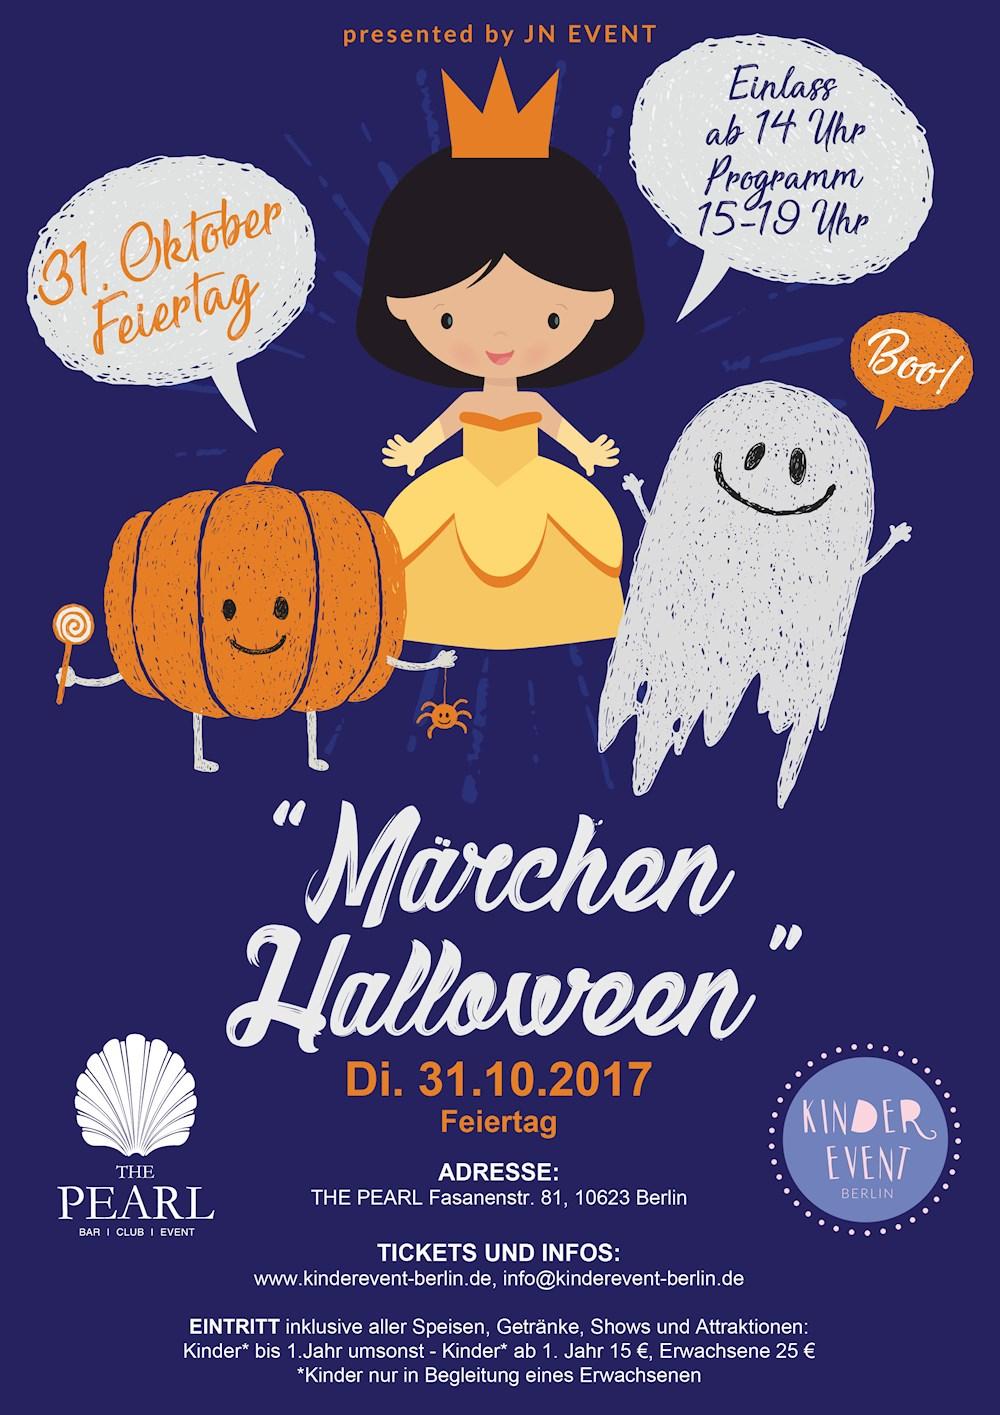 The Pearl Berlin Märchen Halloween